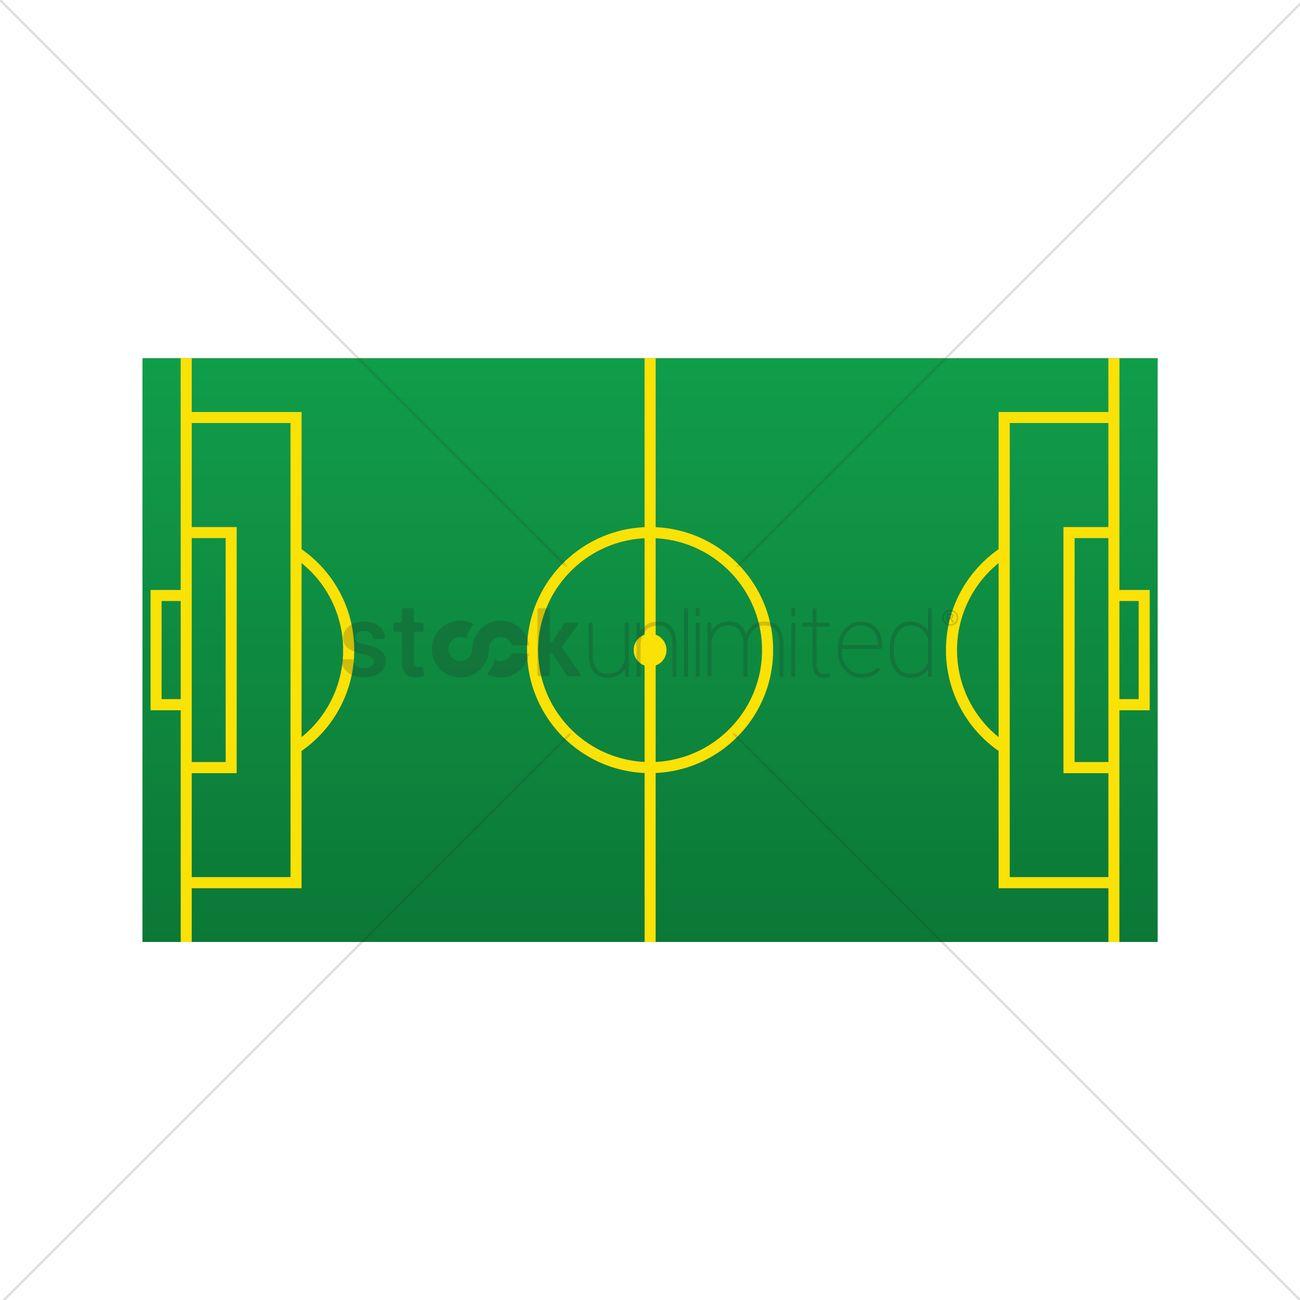 football field vector image 1571732 stockunlimited rh stockunlimited com football field vector free football field vector art free